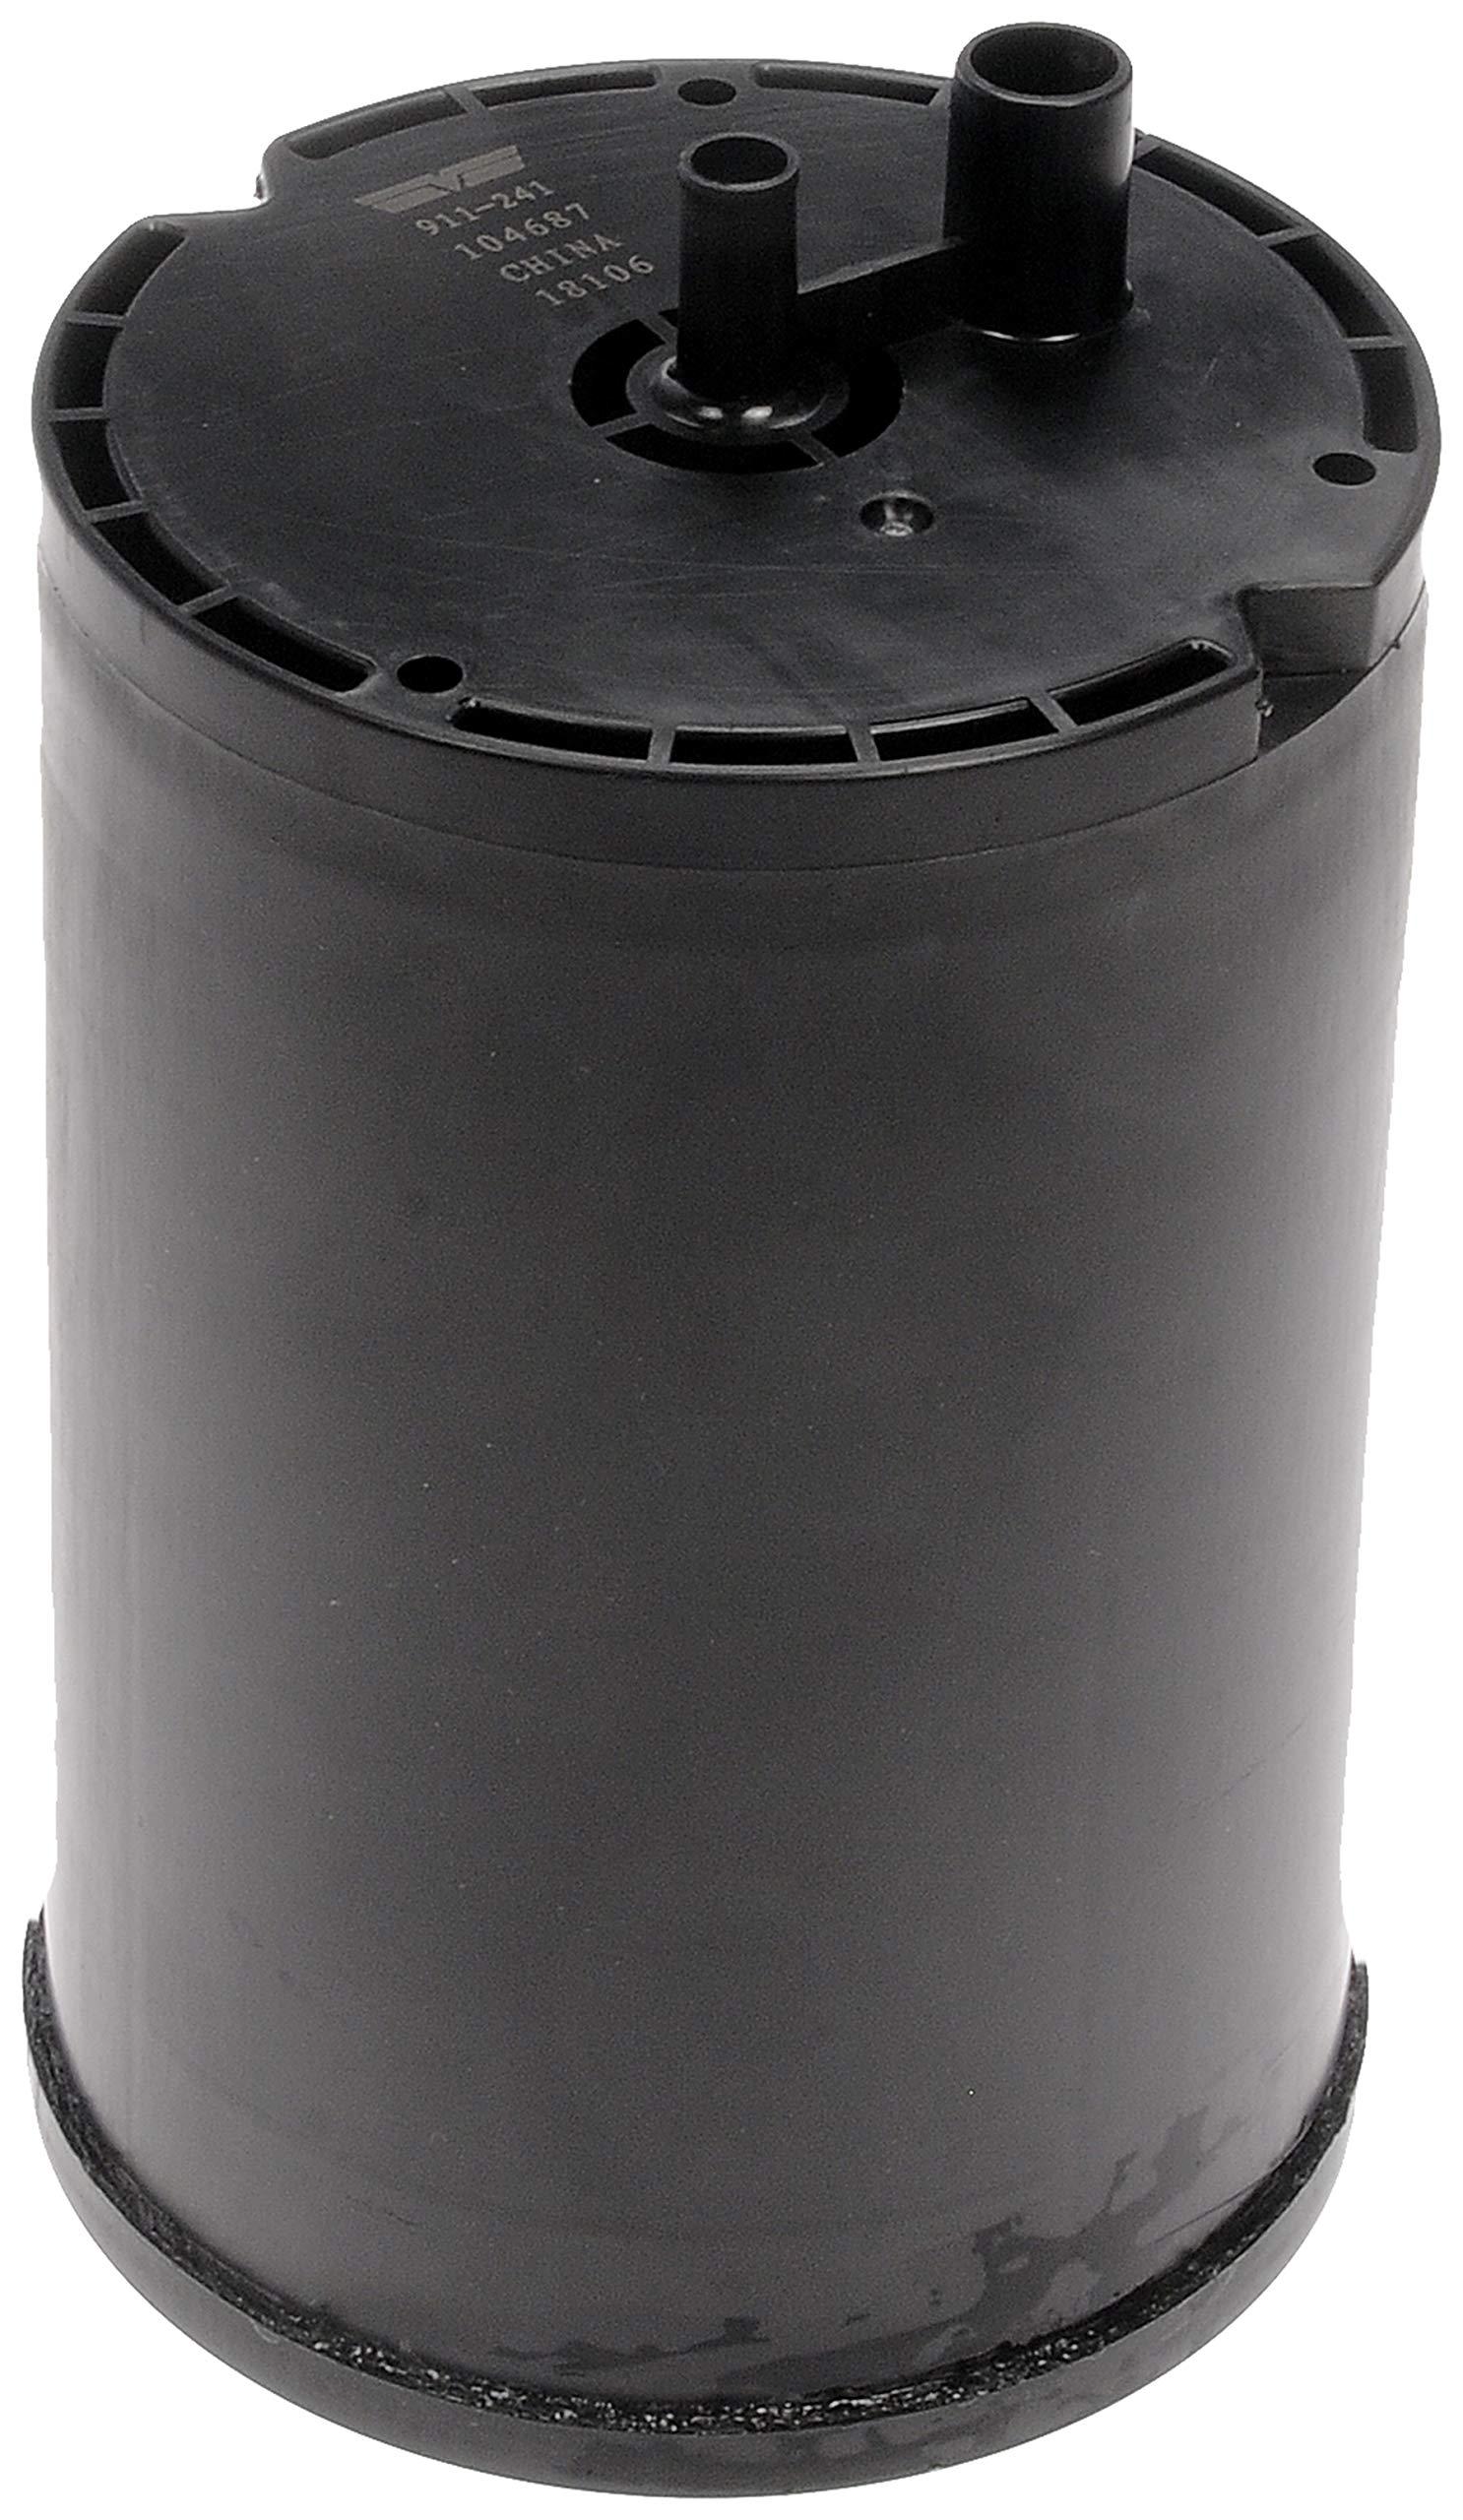 Dorman 911-241 Evaporative Emissions Charcoal Canister for Select Dodge Ram Models by Dorman